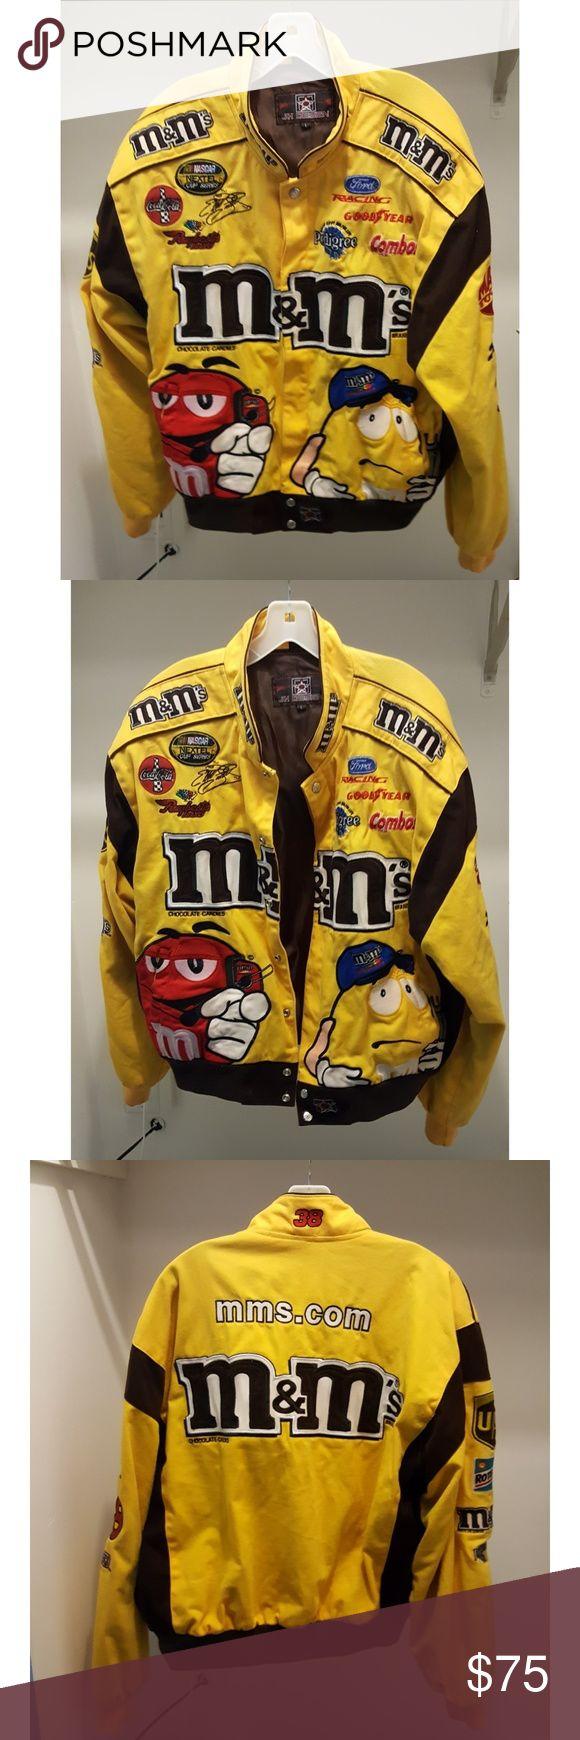 🔥NASCAR JACKET🔥 Hello,  You will receive the following:  A THROWBACK ELLIOTT SADLER NASCAR M&M's JACKET!!!...#38  ***Worn a few times***  ***Still in good shape***  Thanks for looking! NASCAR Jackets & Coats